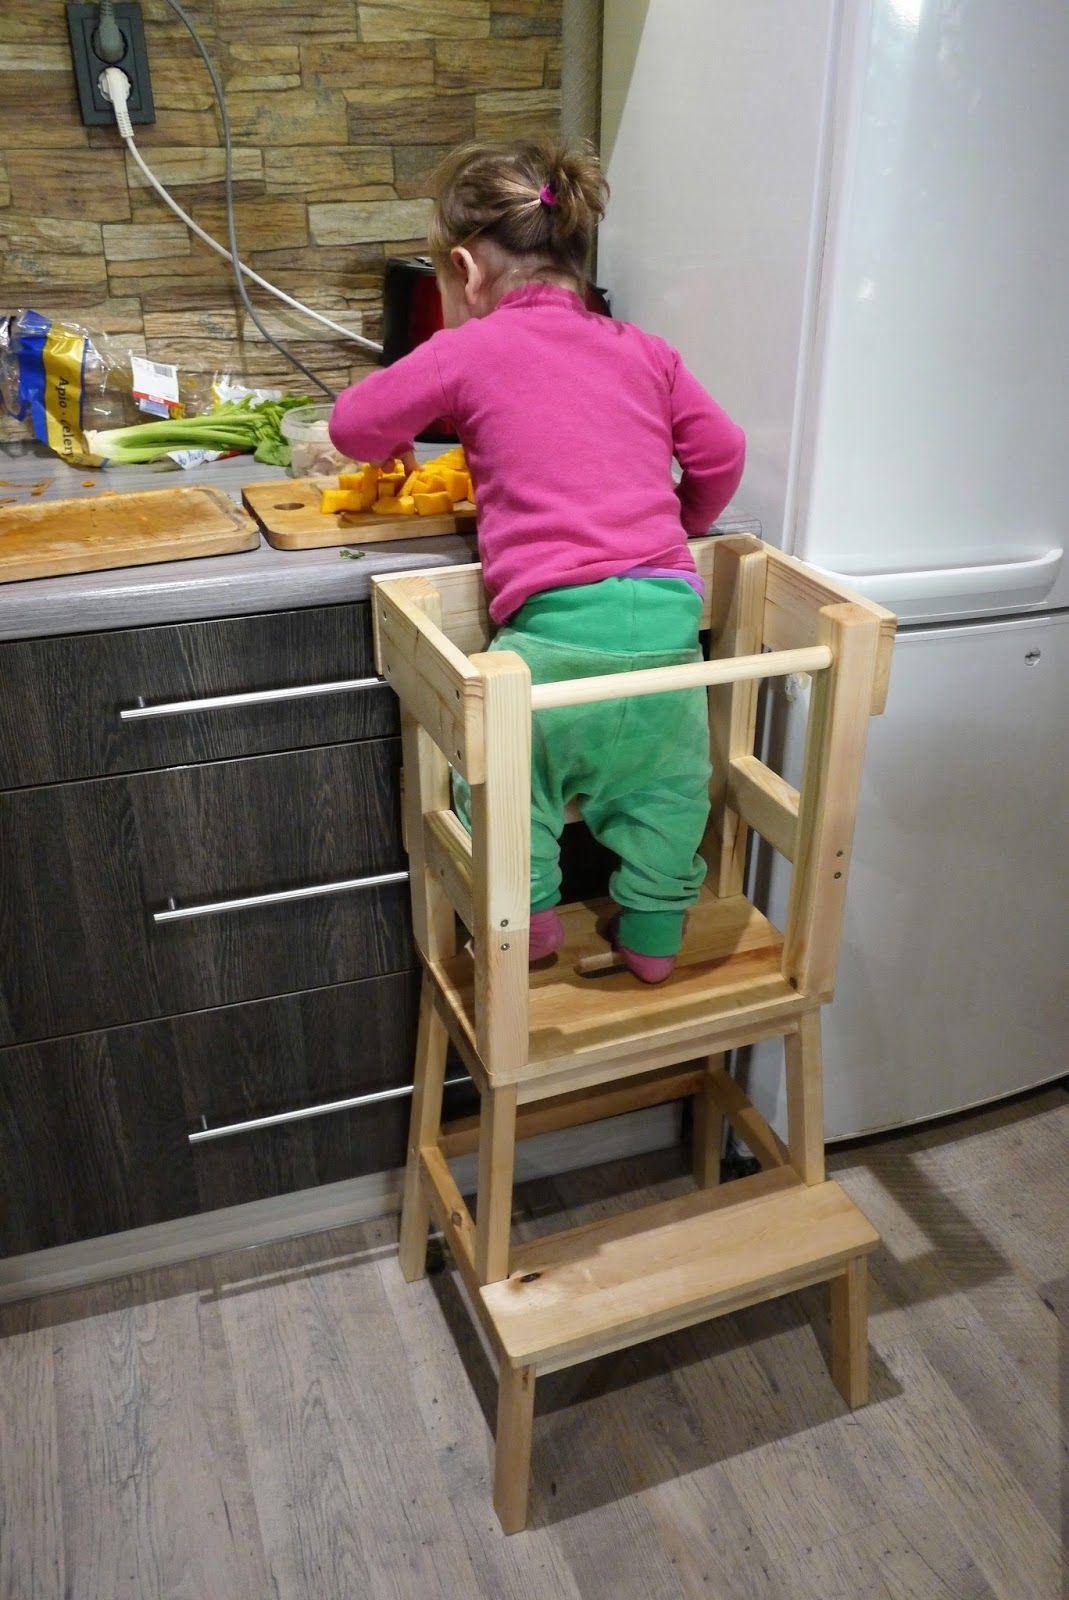 chaise d'apprentissage Montessori | Ikea, Chaise enfant